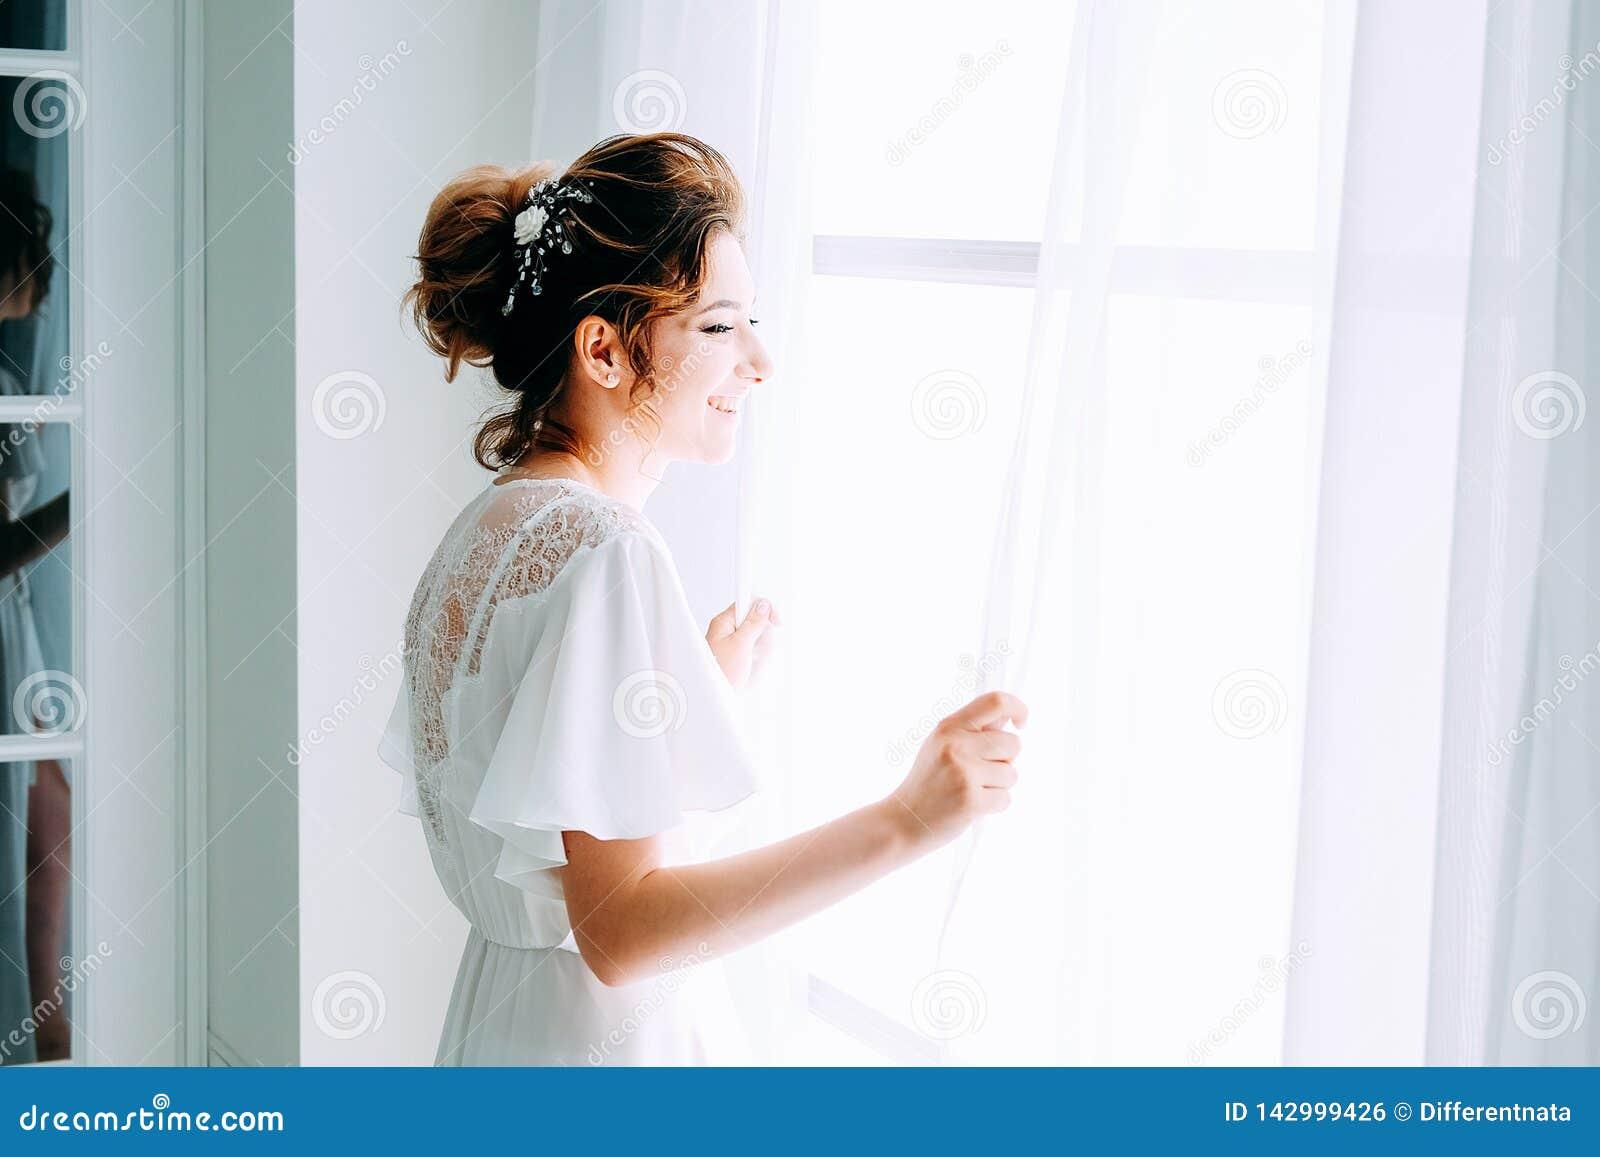 a2d617c48d7 Tender elegant young brunette bride with hairdo